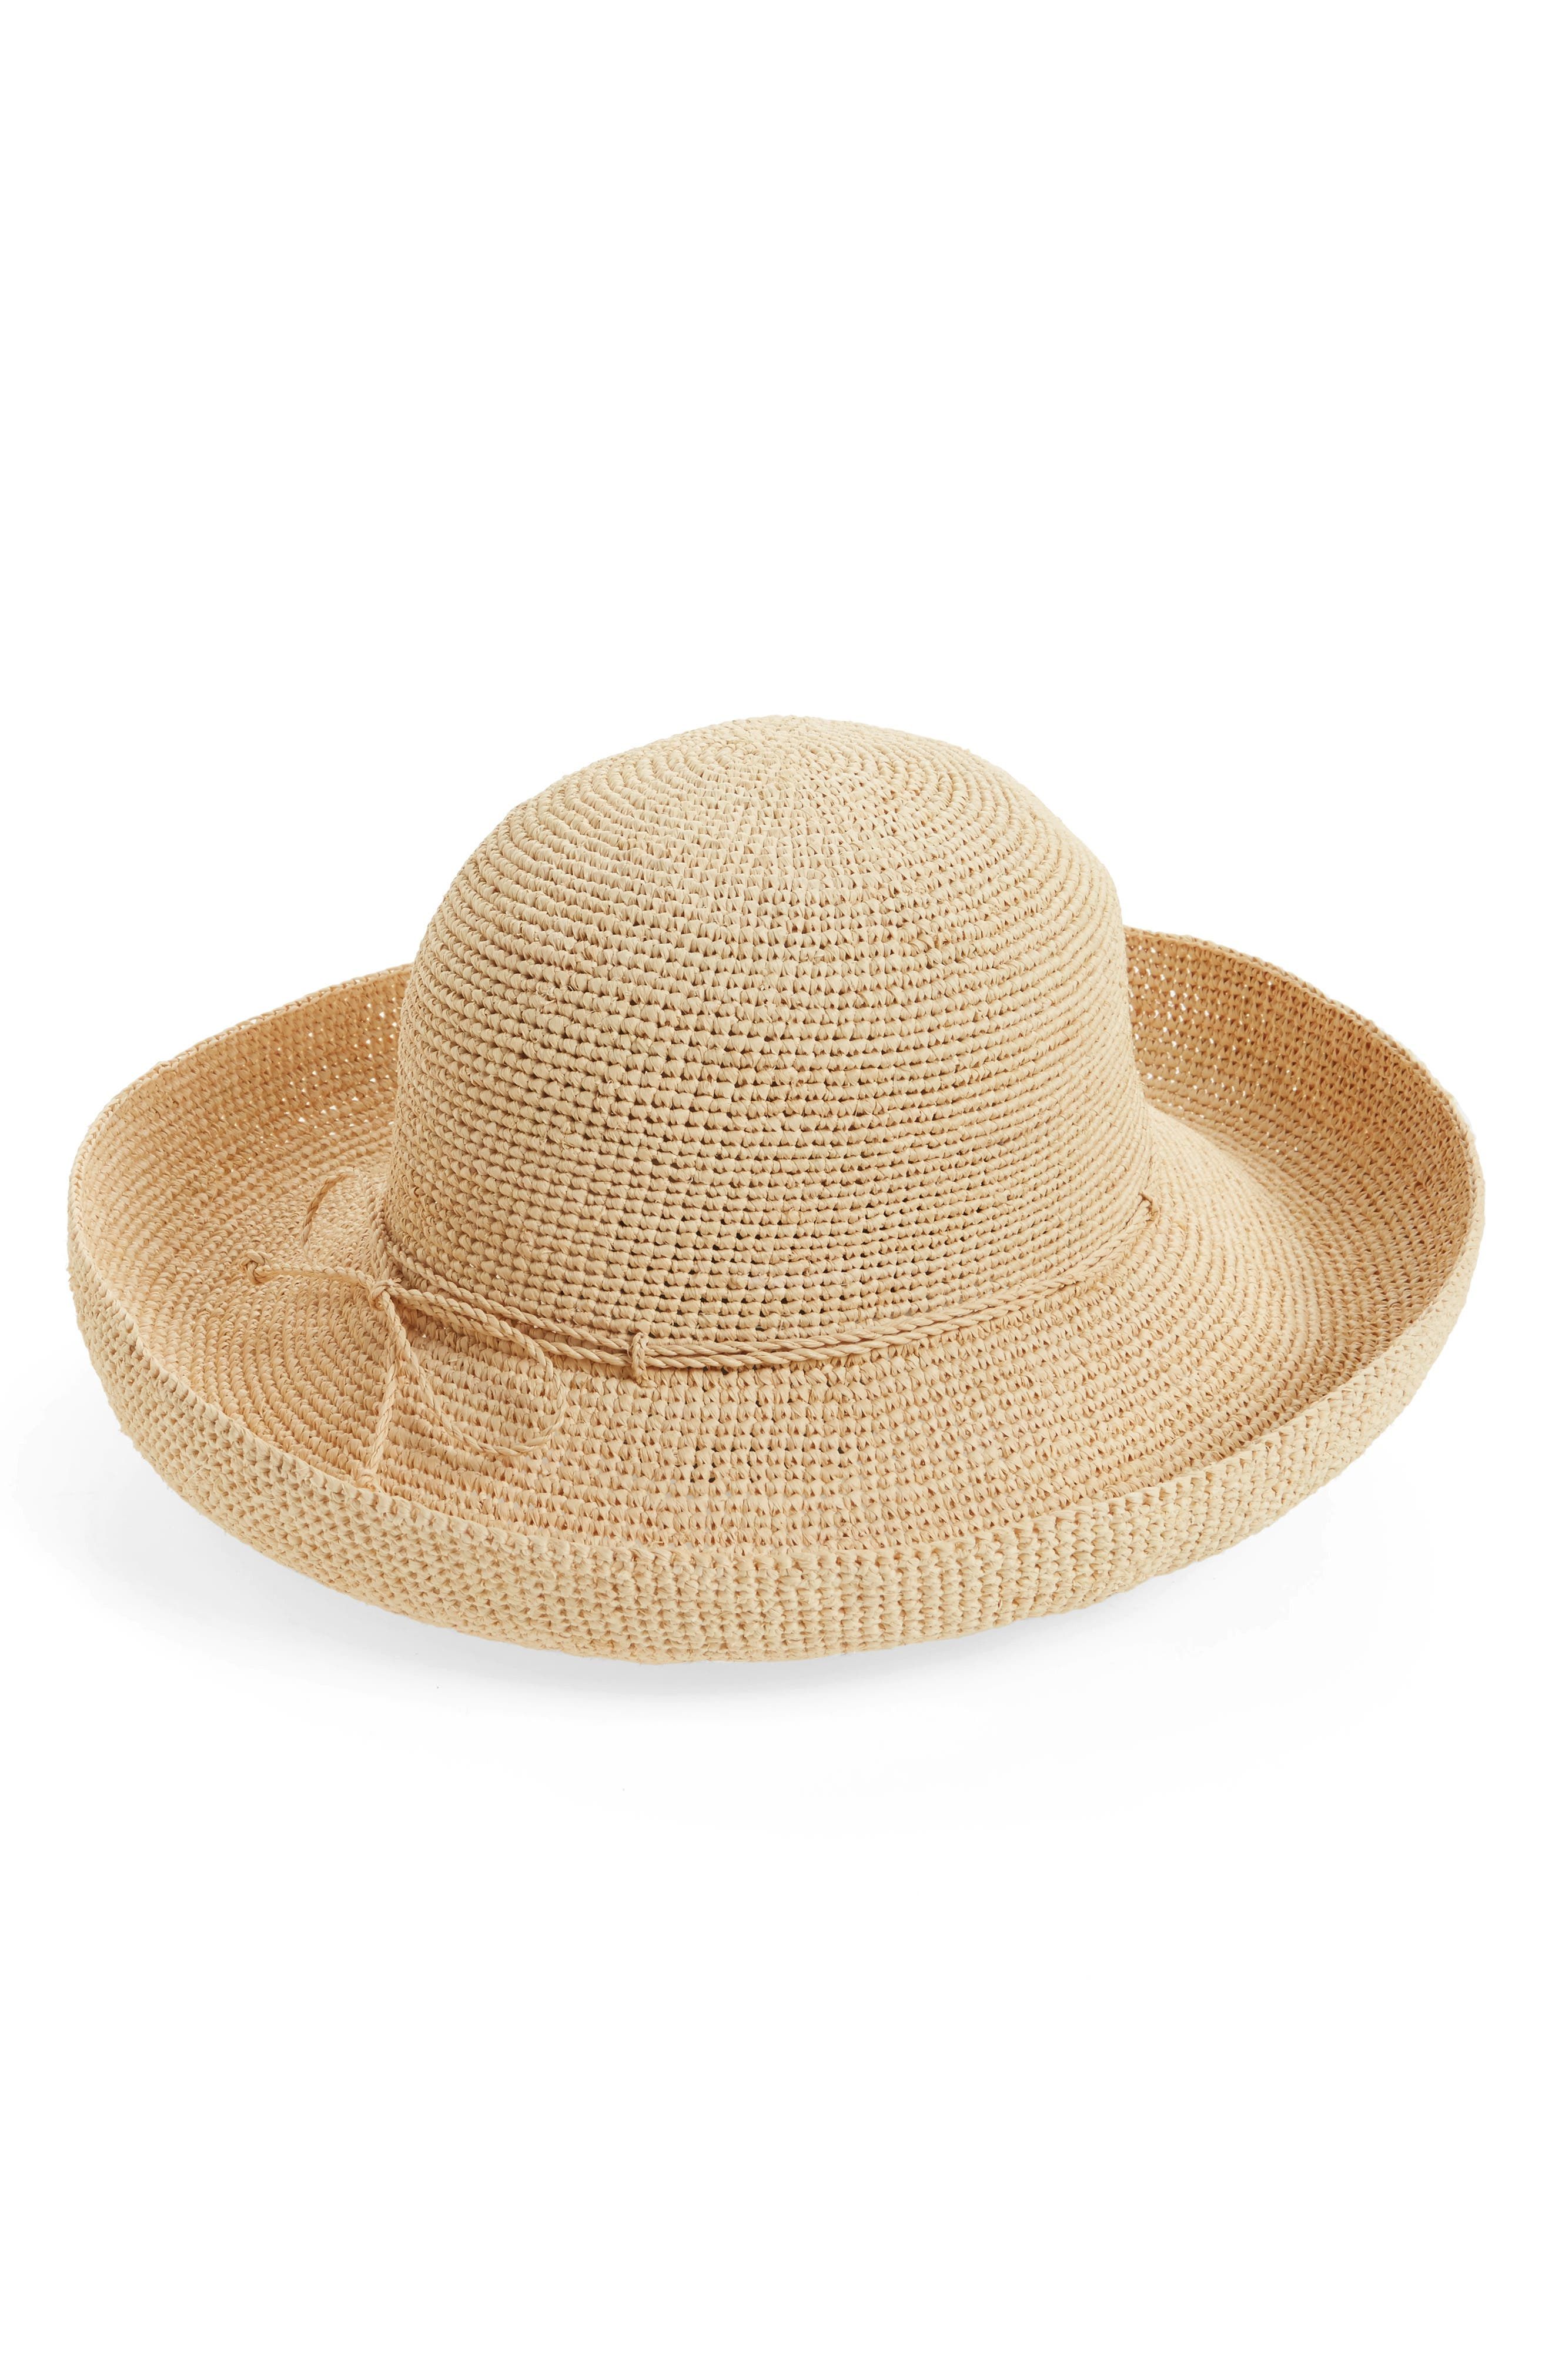 HELEN KAMINSKI,                             'Provence 12' Packable Raffia Hat,                             Alternate thumbnail 2, color,                             NATURAL